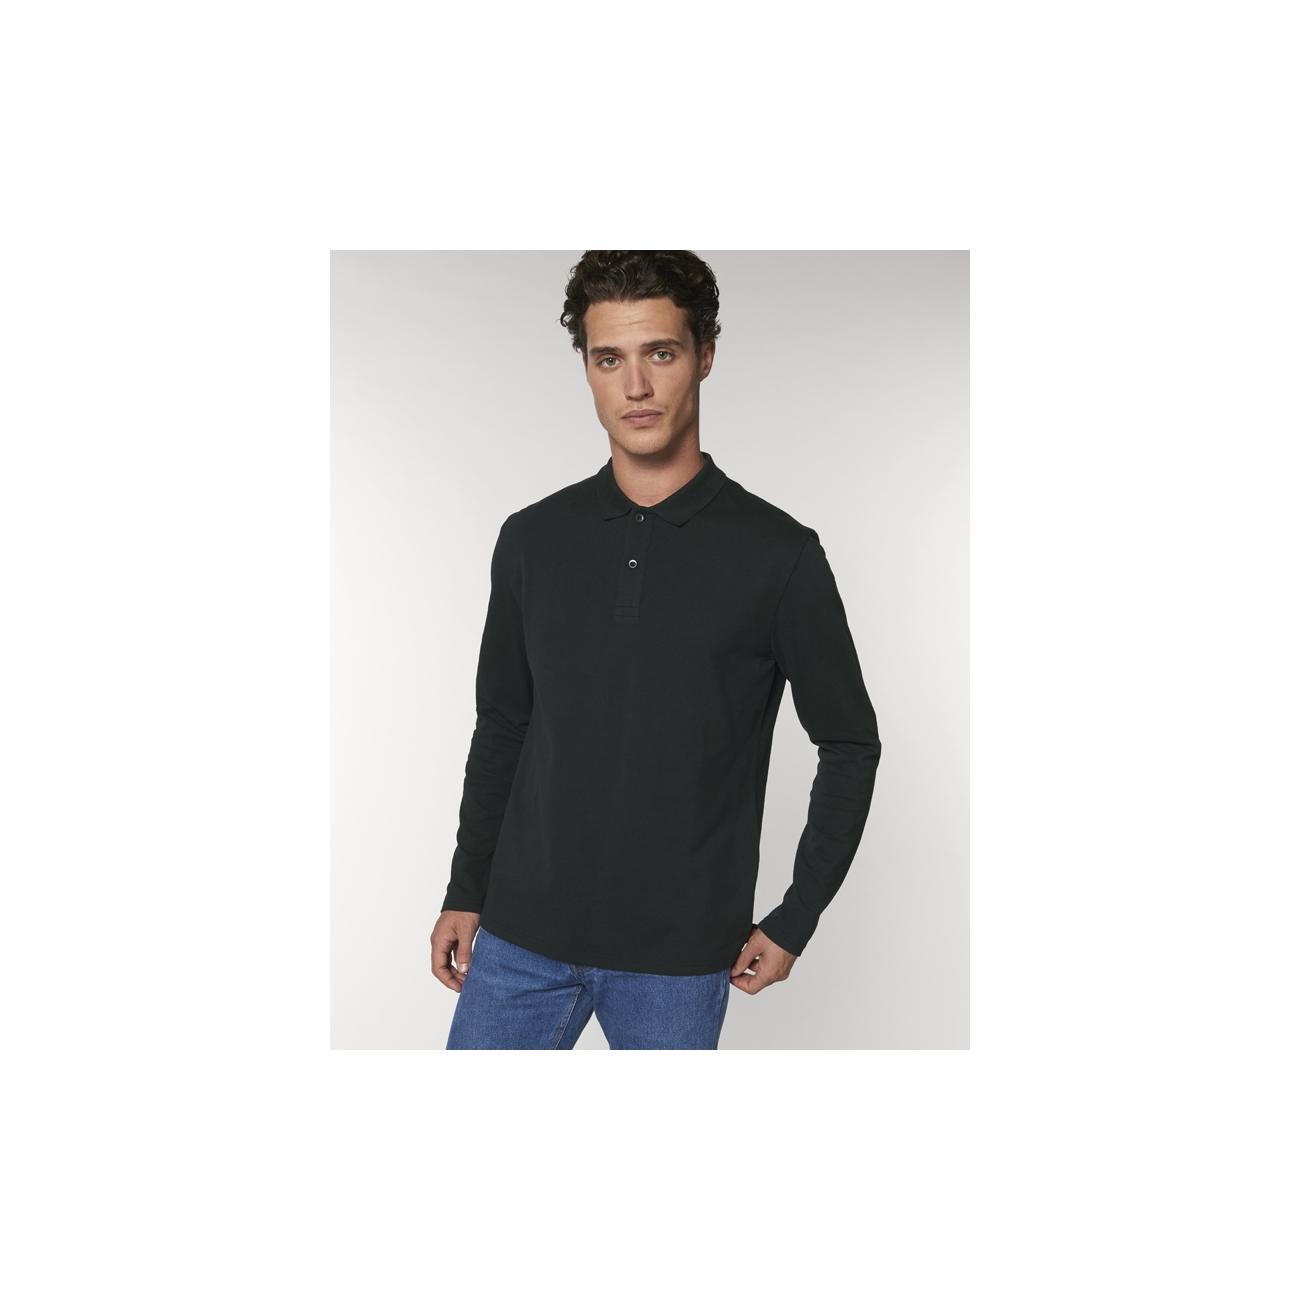 https://tee-shirt-bio.com/9773-thickbox_default/polo-coton-pique-manches-longues-noir.jpg